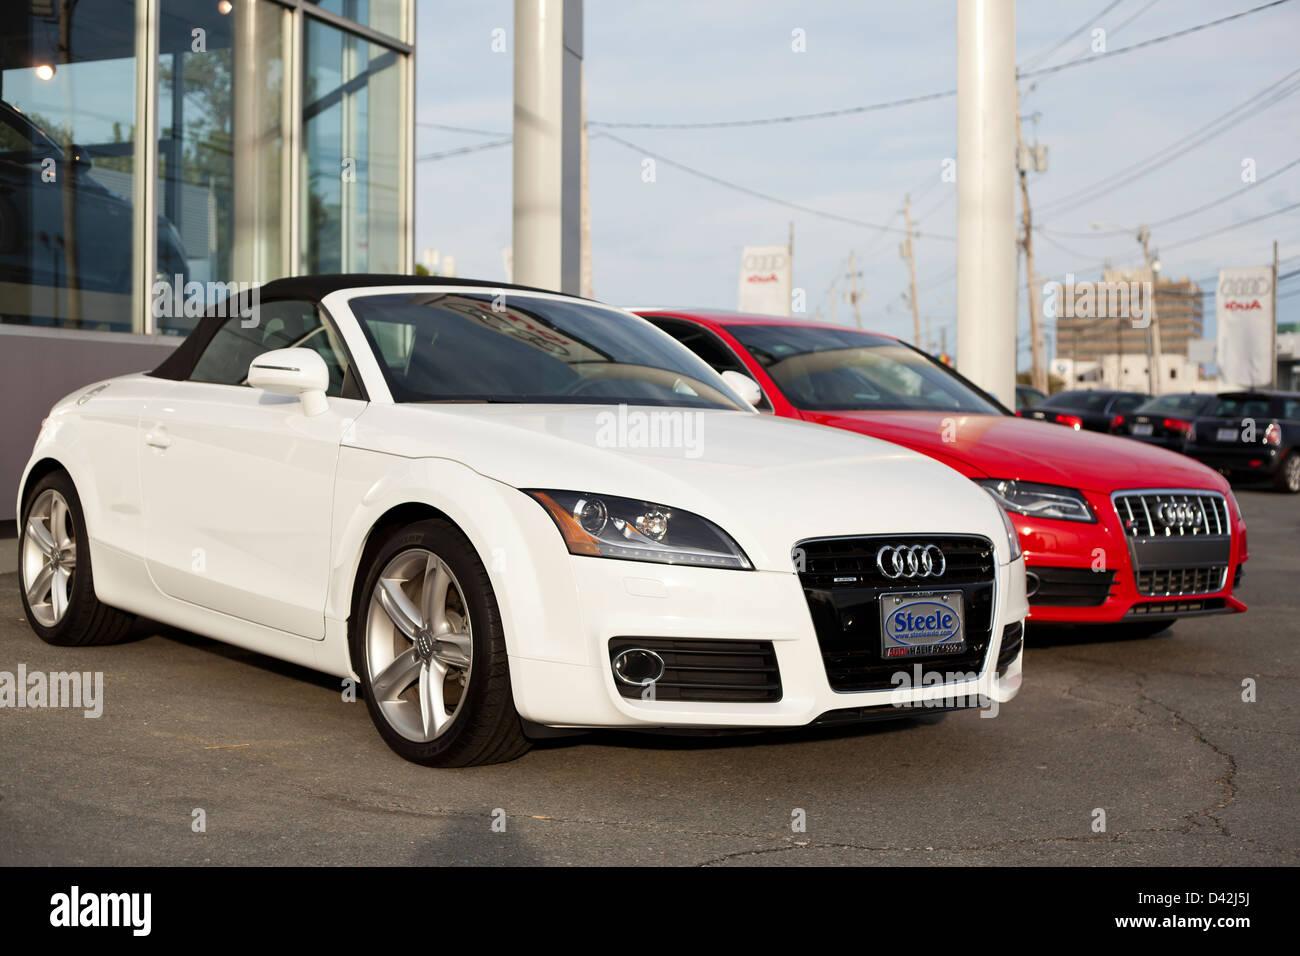 New Audi Tt And S4 Model Cars At A Dealership In Halifax Nova Stock Photo Alamy